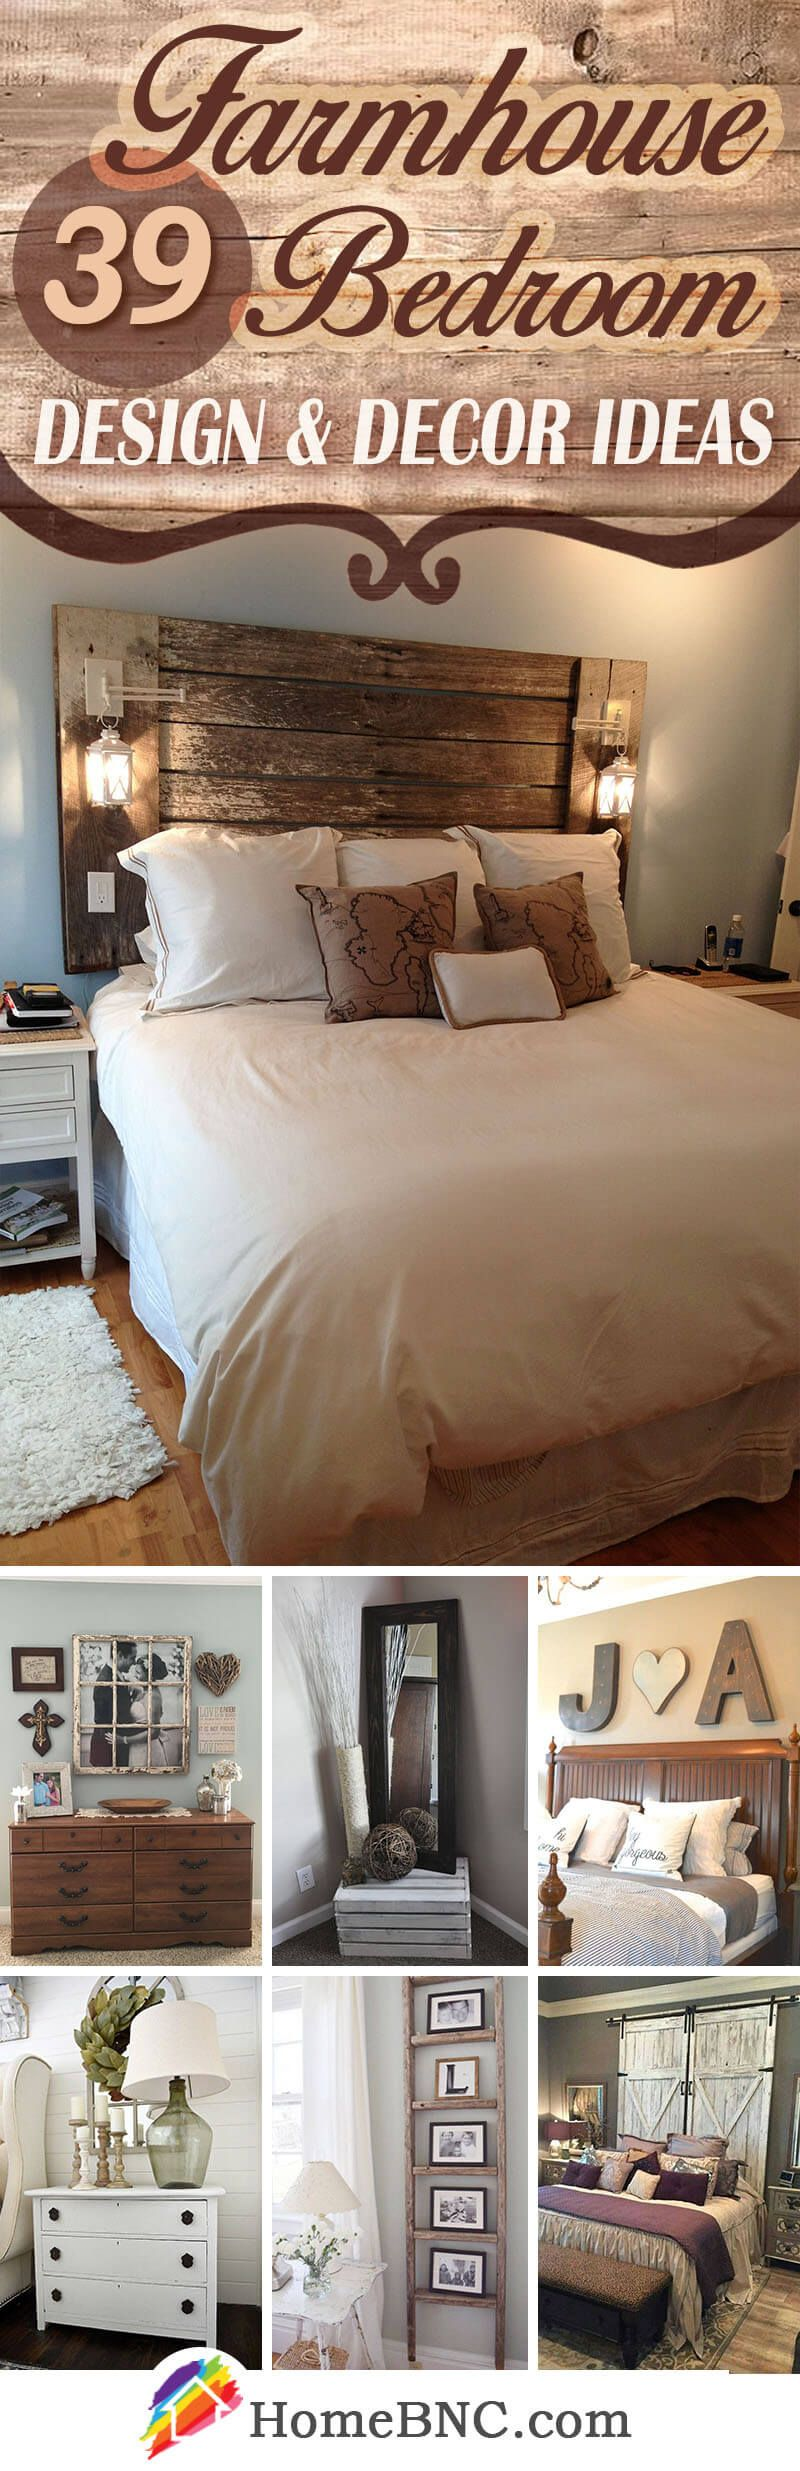 4 Rustic Farmhouse Bedroom Design and Decor Ideas To Transform